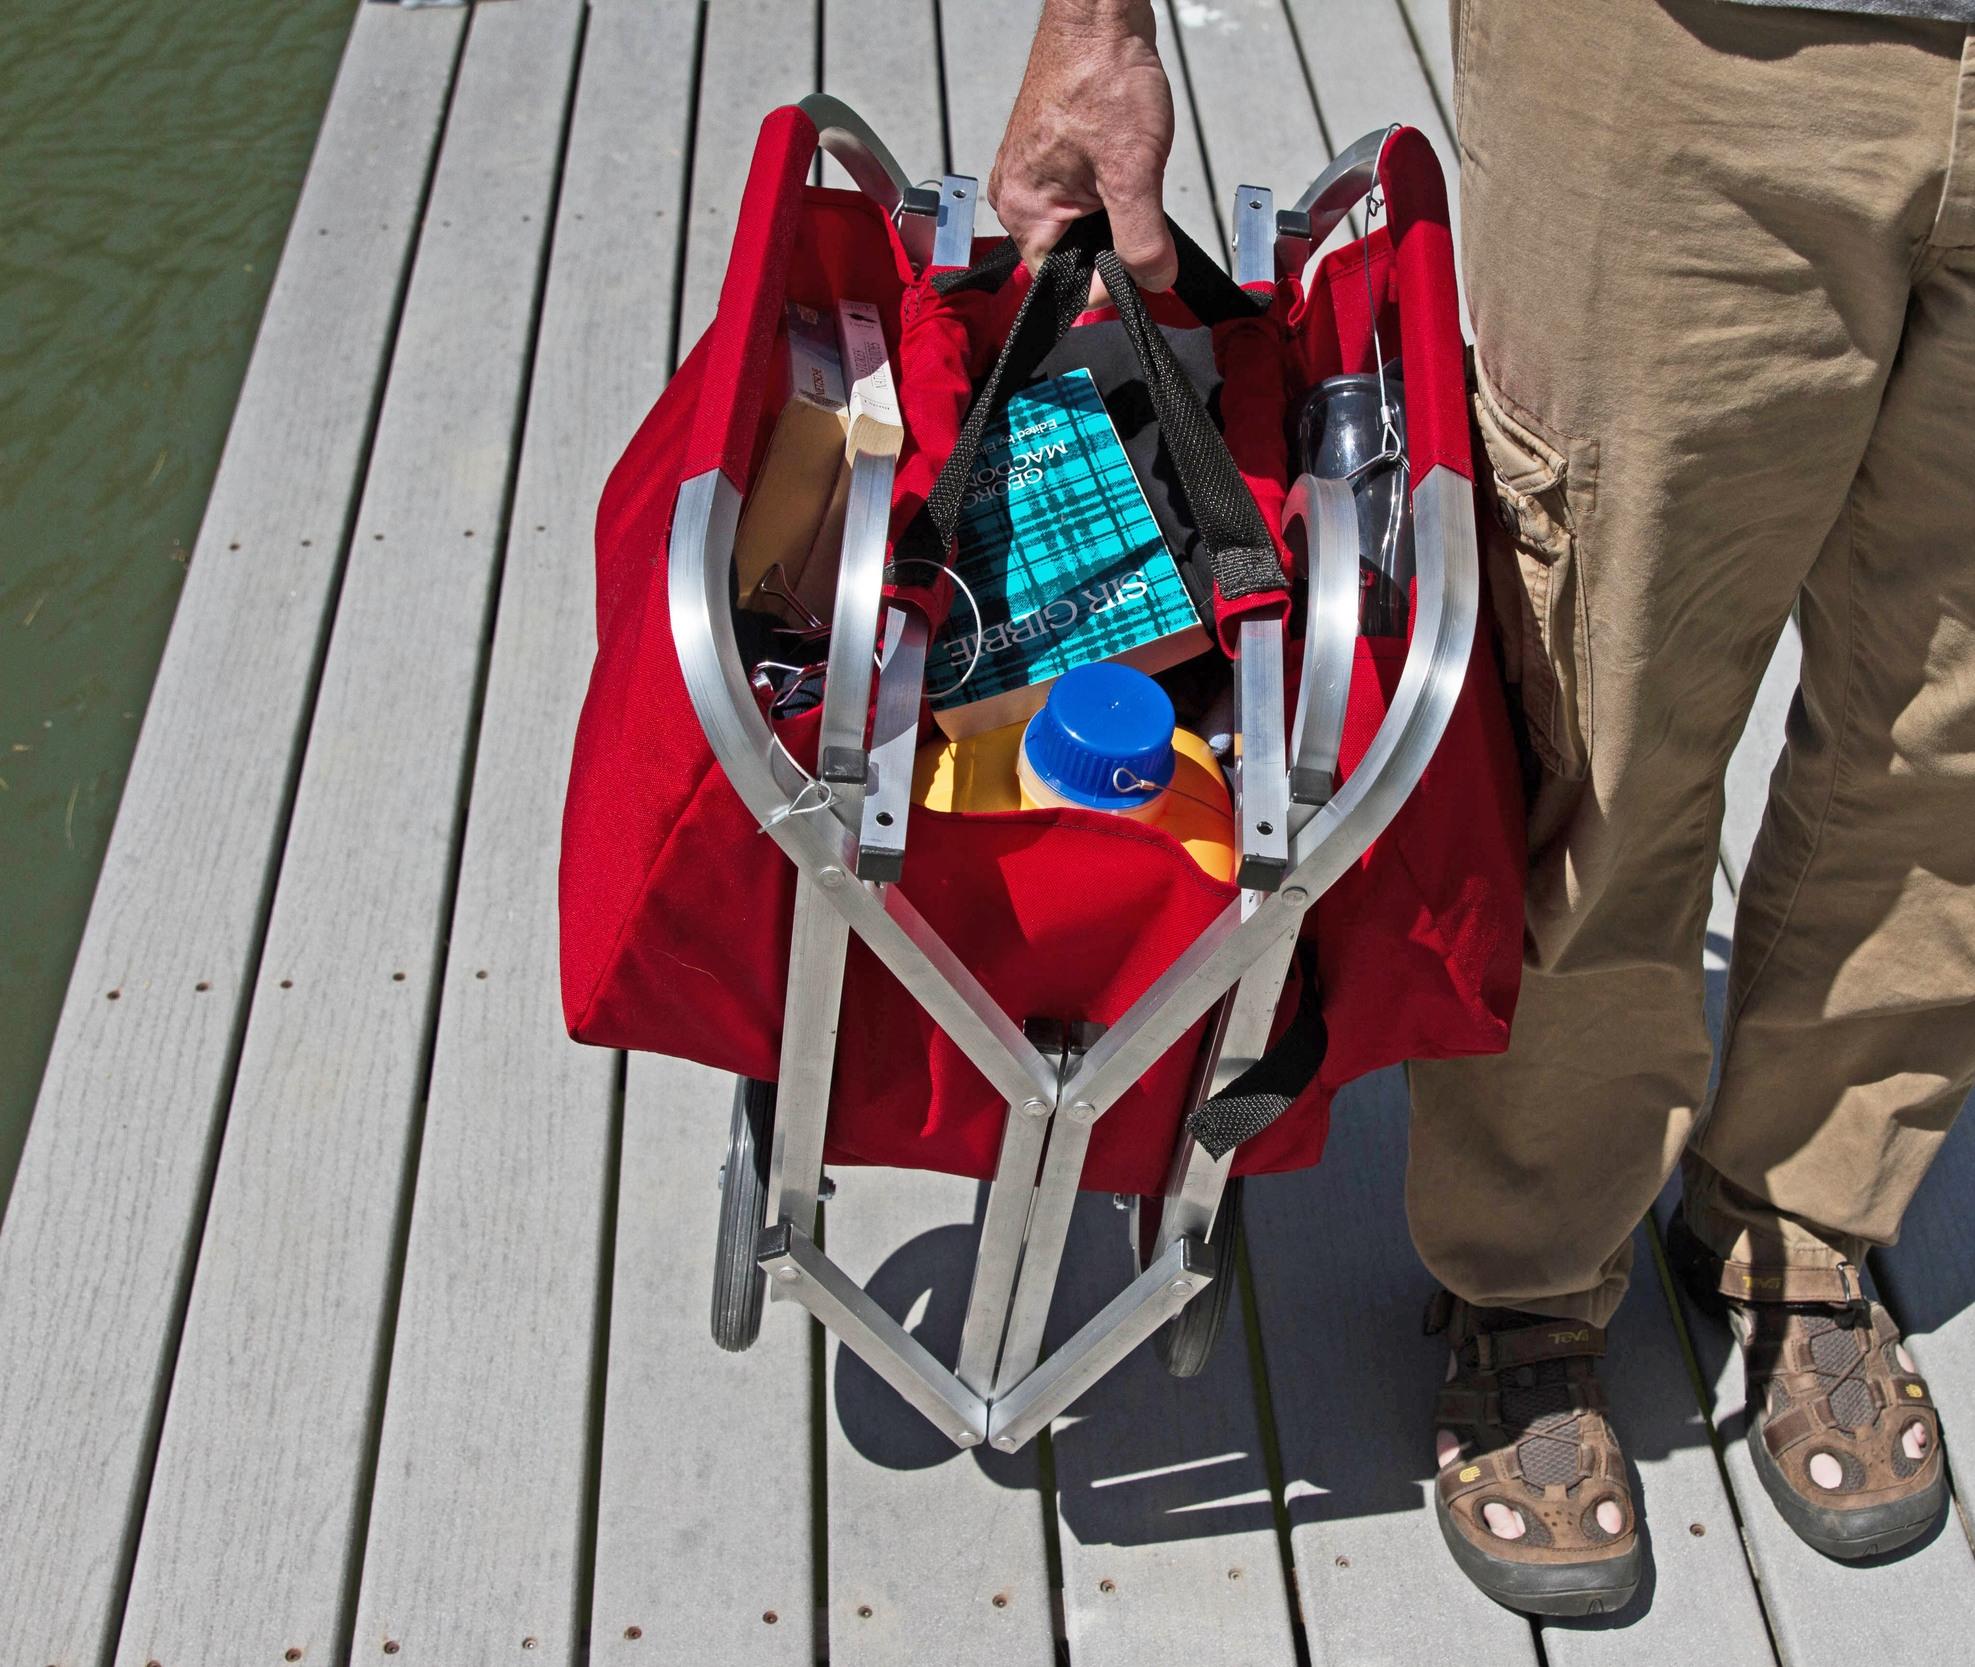 City Companion - Pack It Full - Climb Onboard